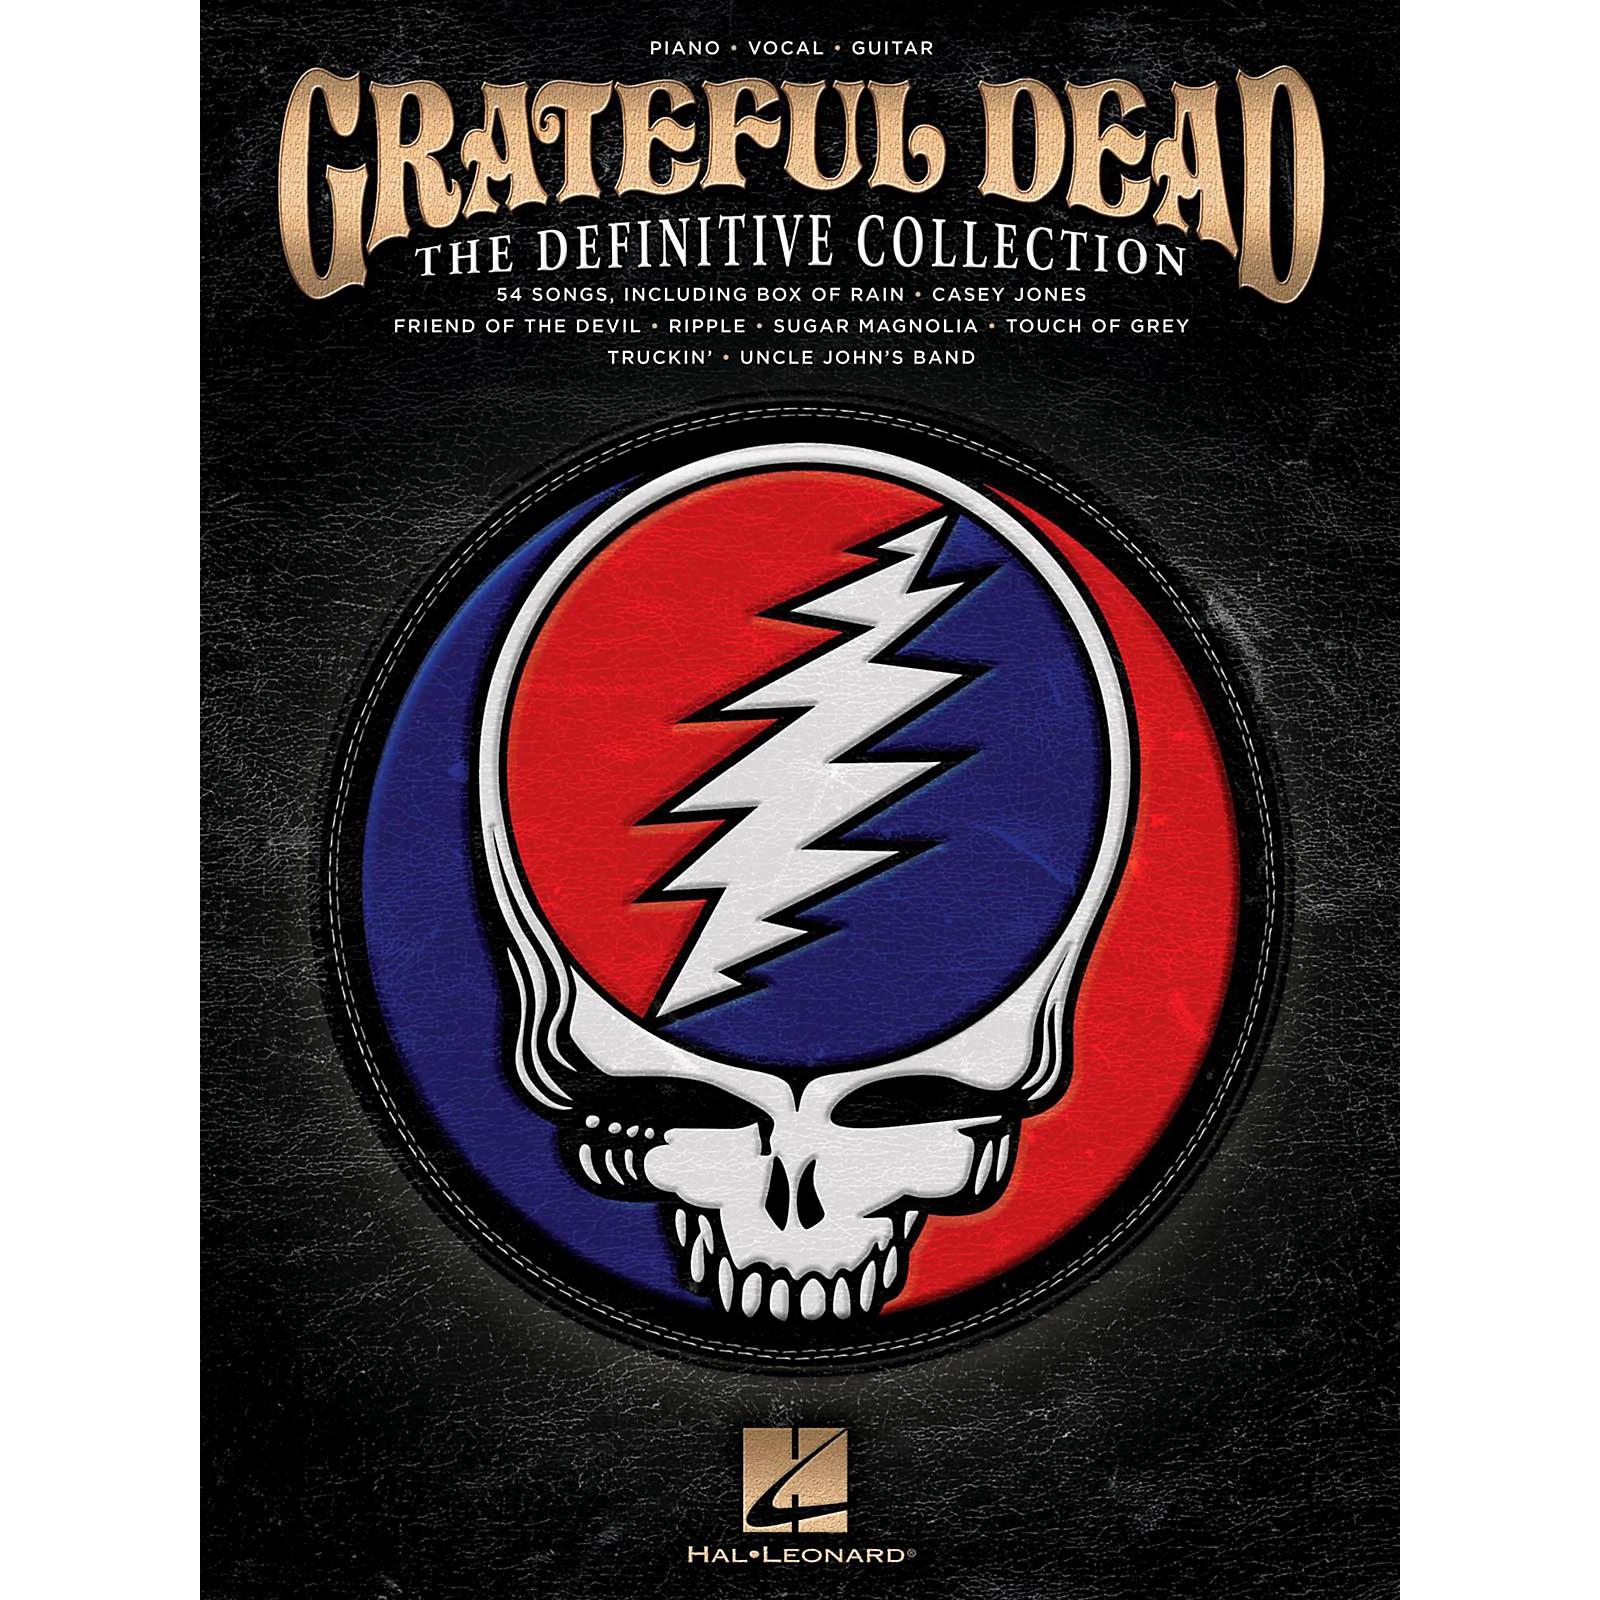 Hal Leonard Grateful Dead - The Definitive Collection Piano/Vocal/Guitar